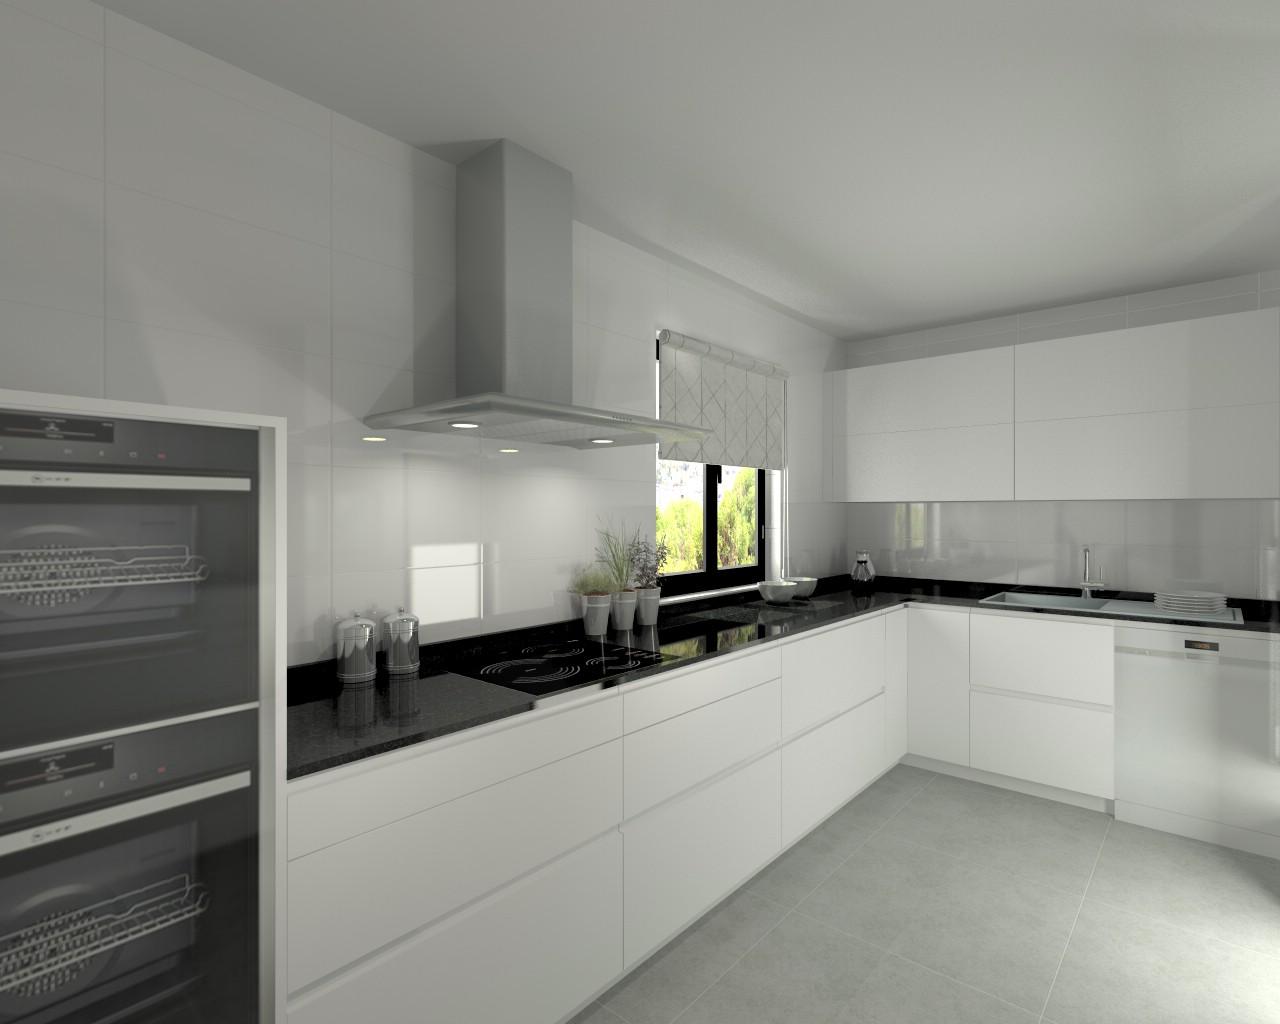 Aravaca cocina santos modelo line l blanco seda - Encimera granito negro ...